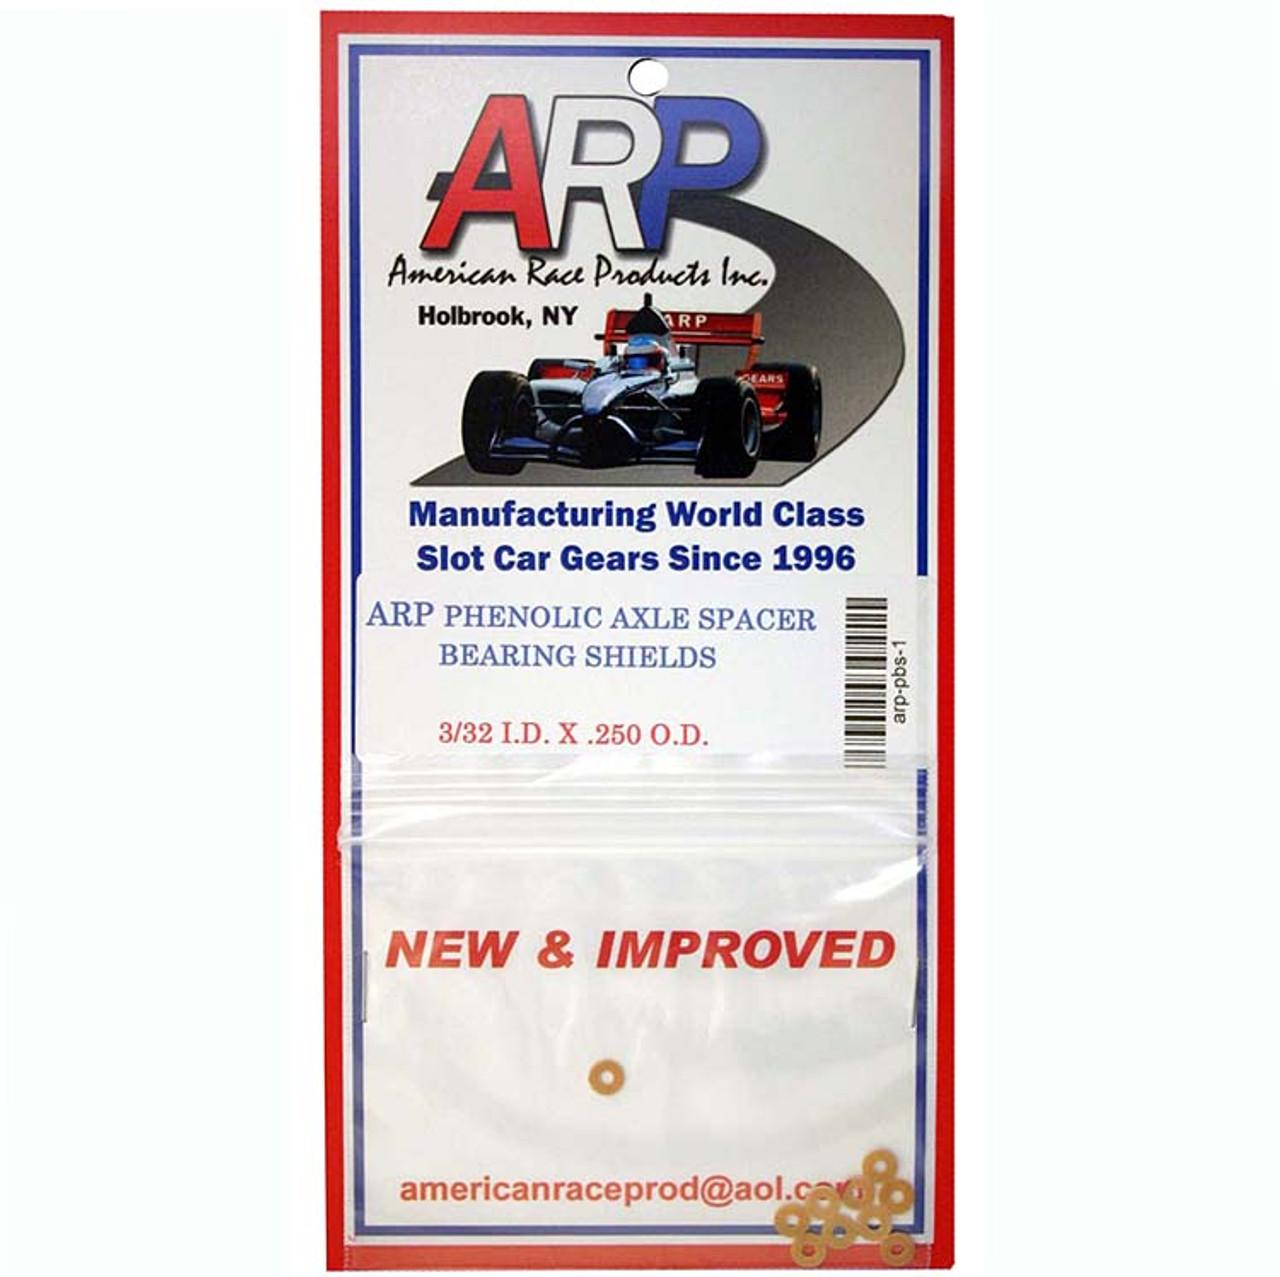 ARP Phenolic Axle Spacer Shields - ARP-PBS1